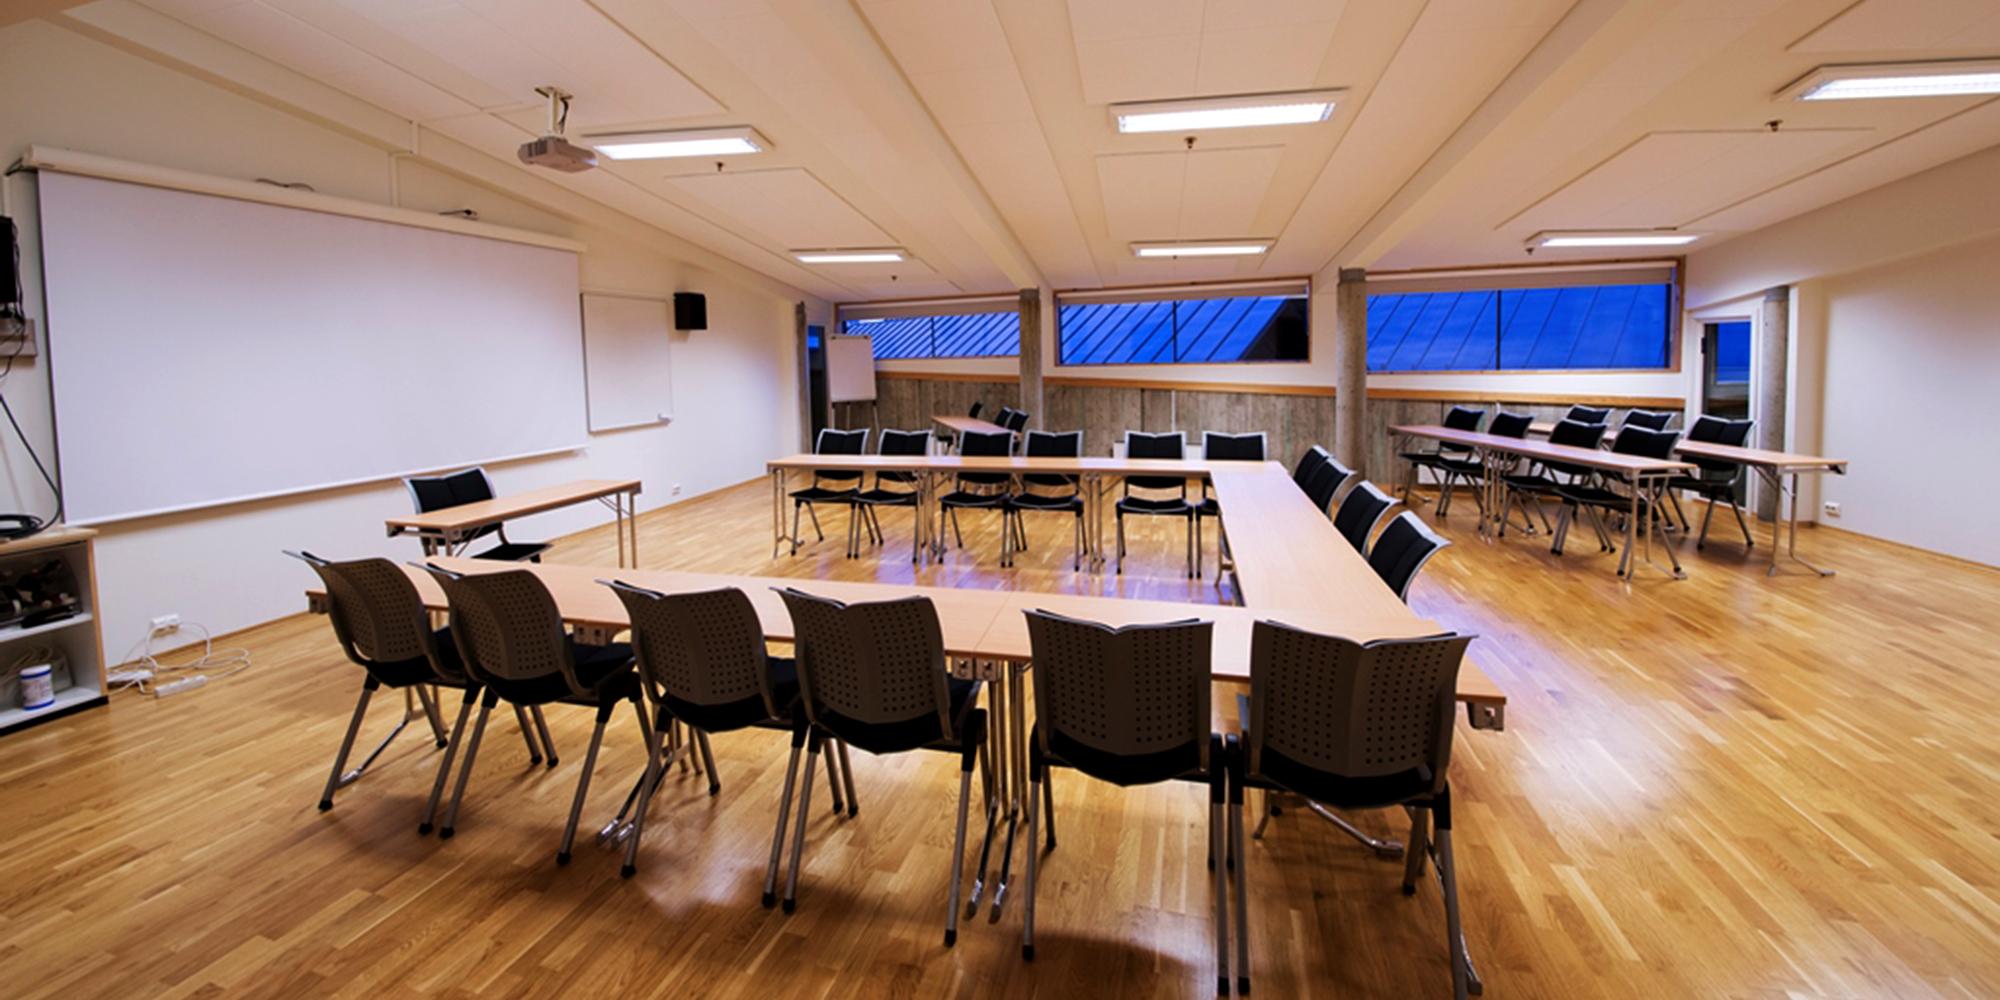 Stiklestad Hotell - meeting room. Copyright: Stiklestad Hotell